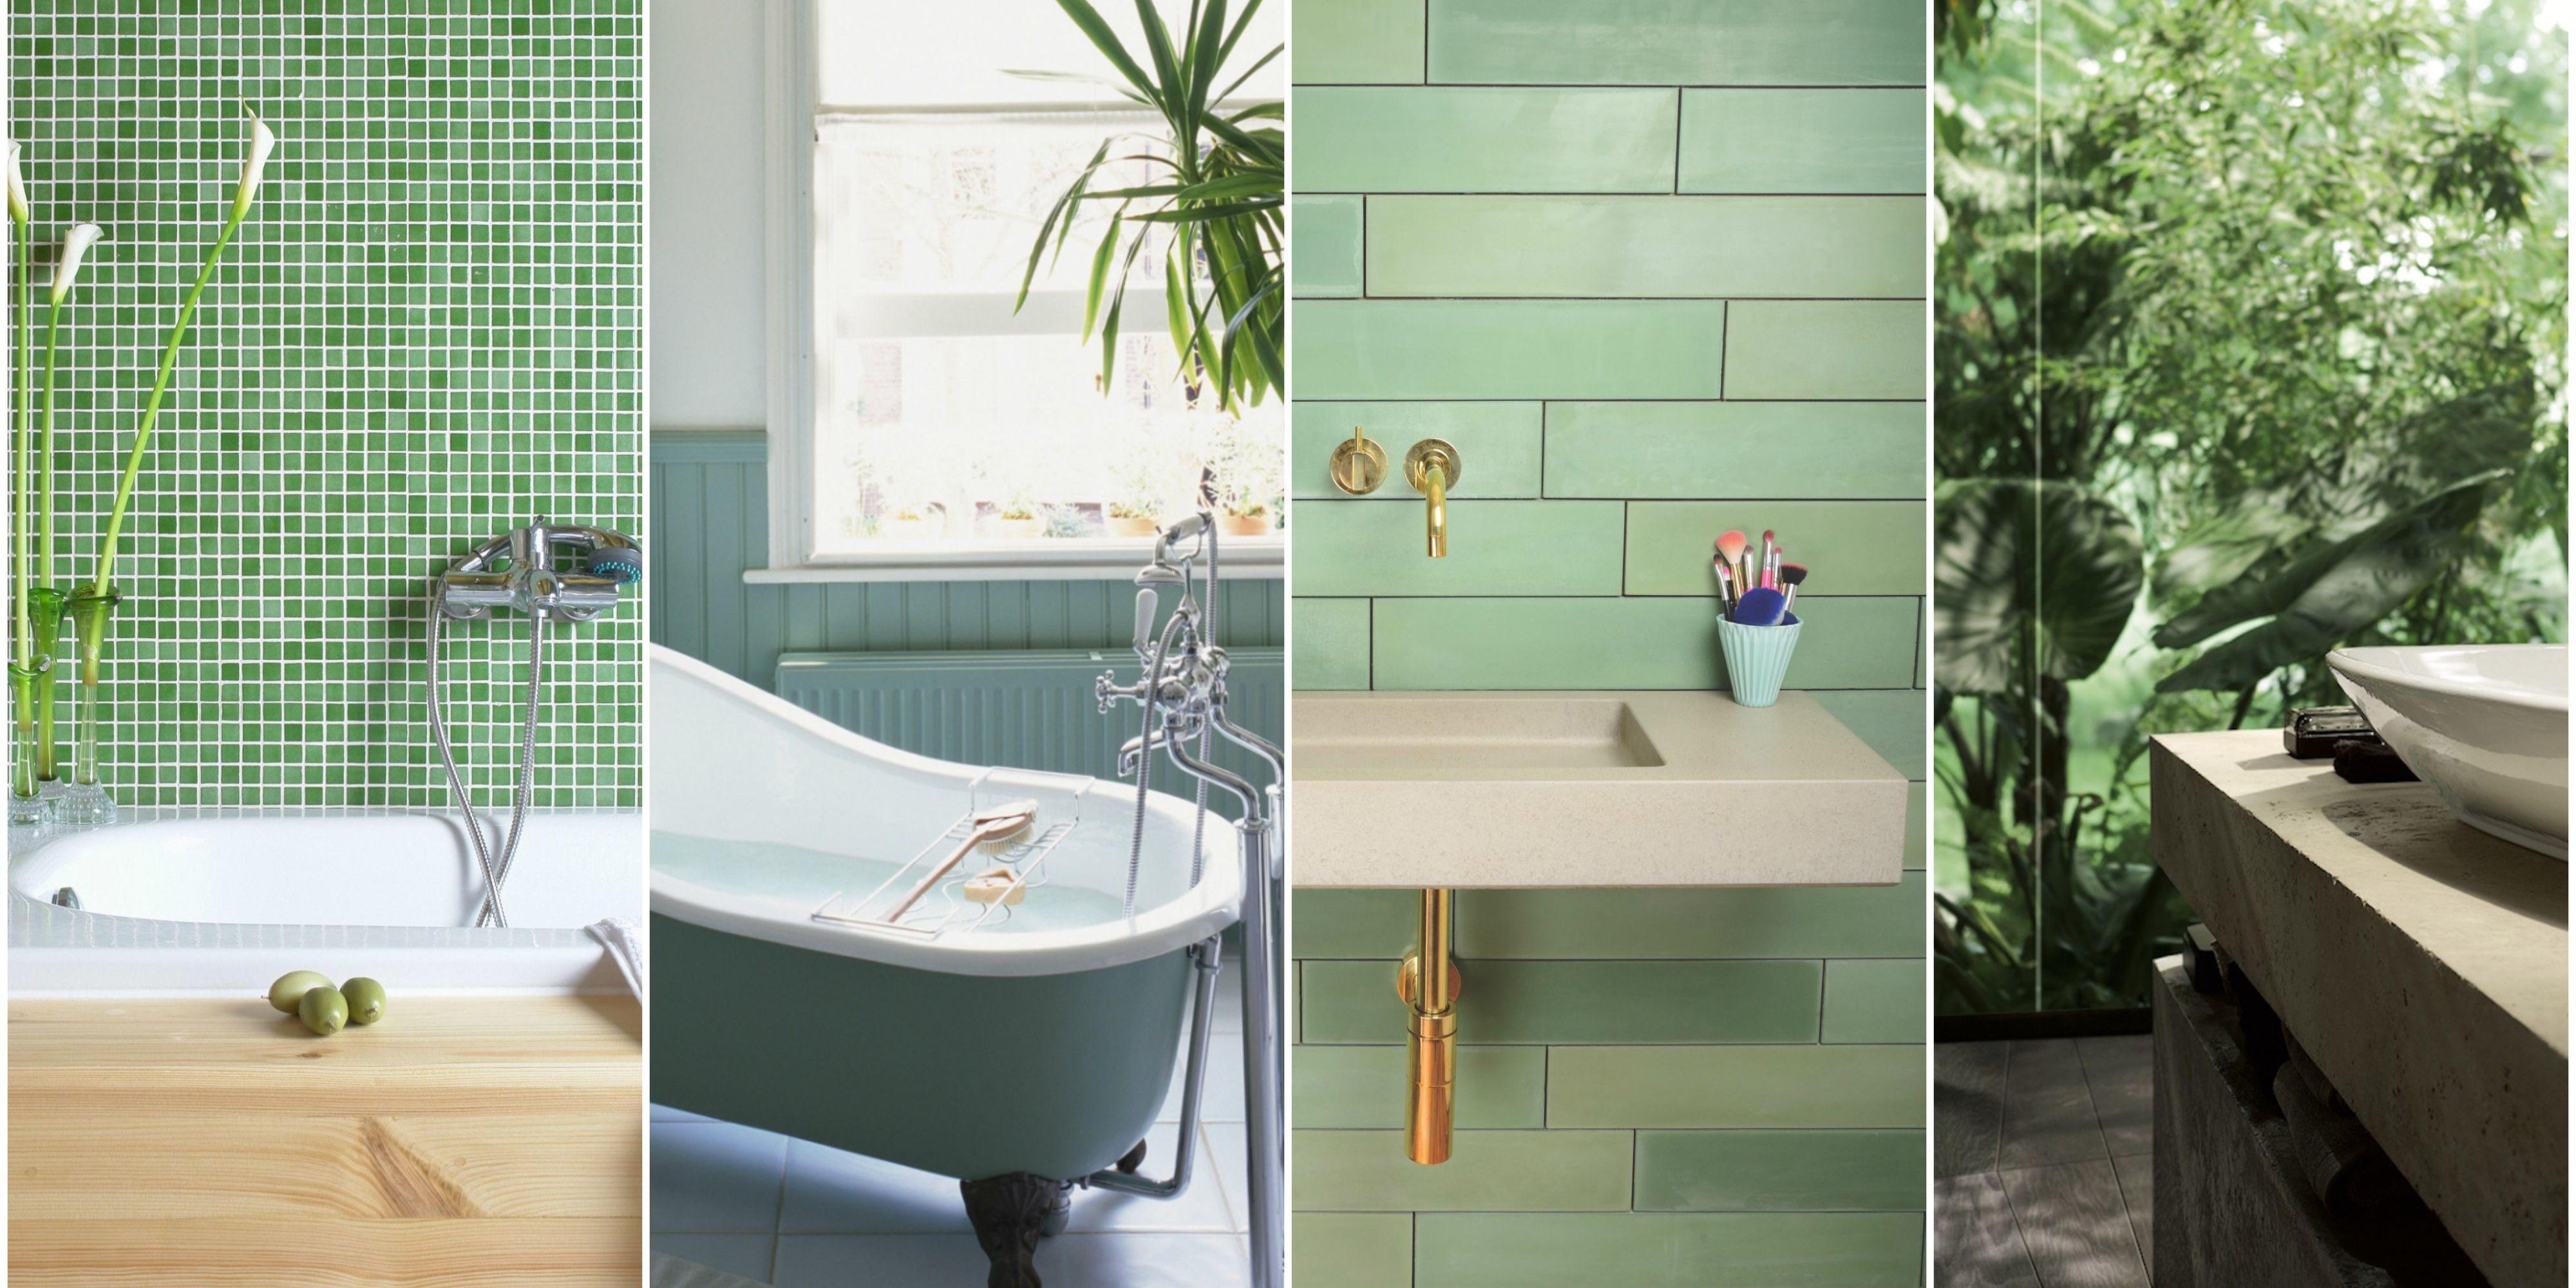 7 Green Bathroom Decor Ideas - Designs, Furniture and Accessories